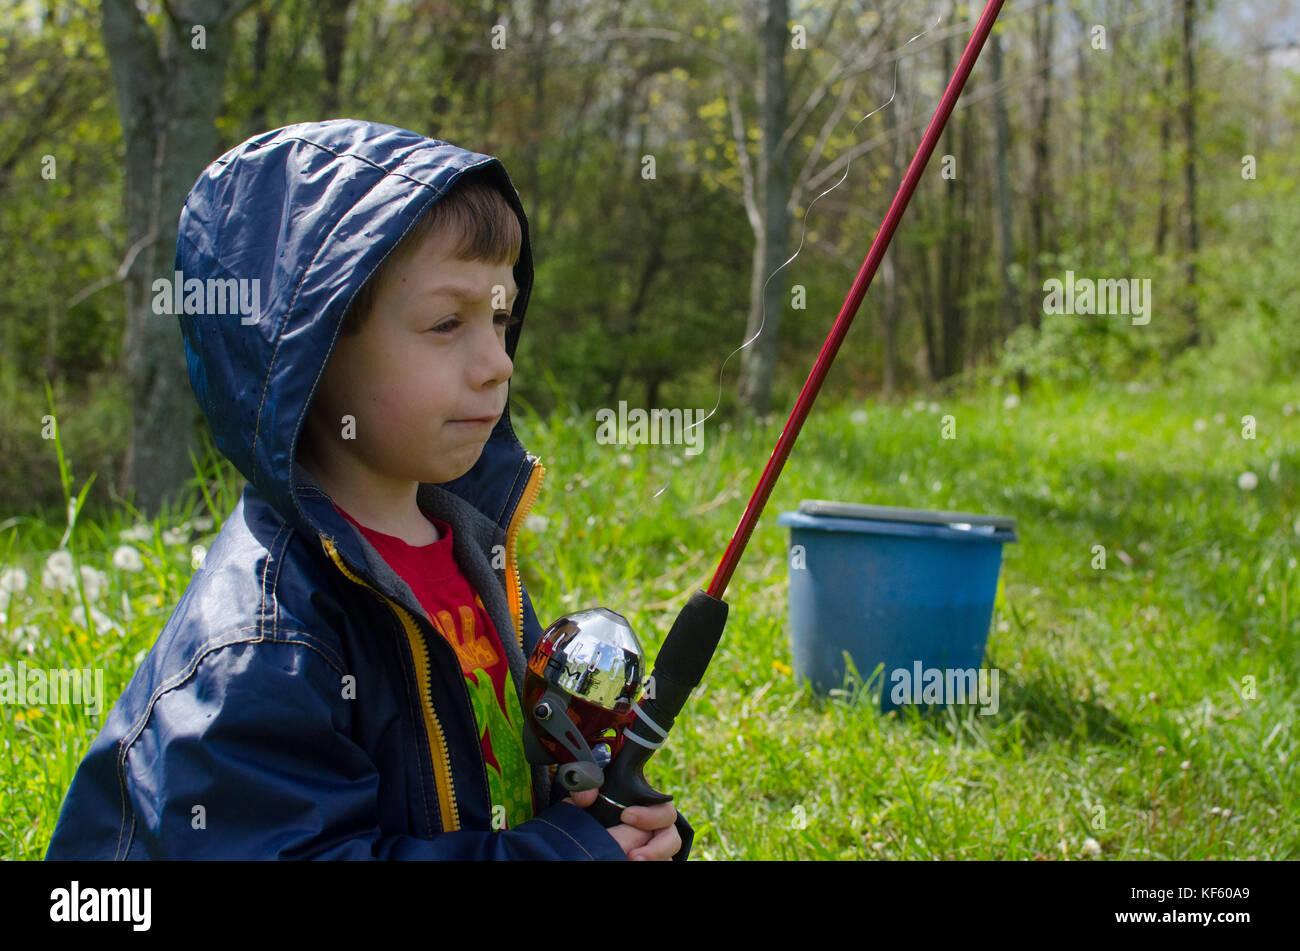 5-6 ans garçon de pêche d'un étang en été. Photo Stock